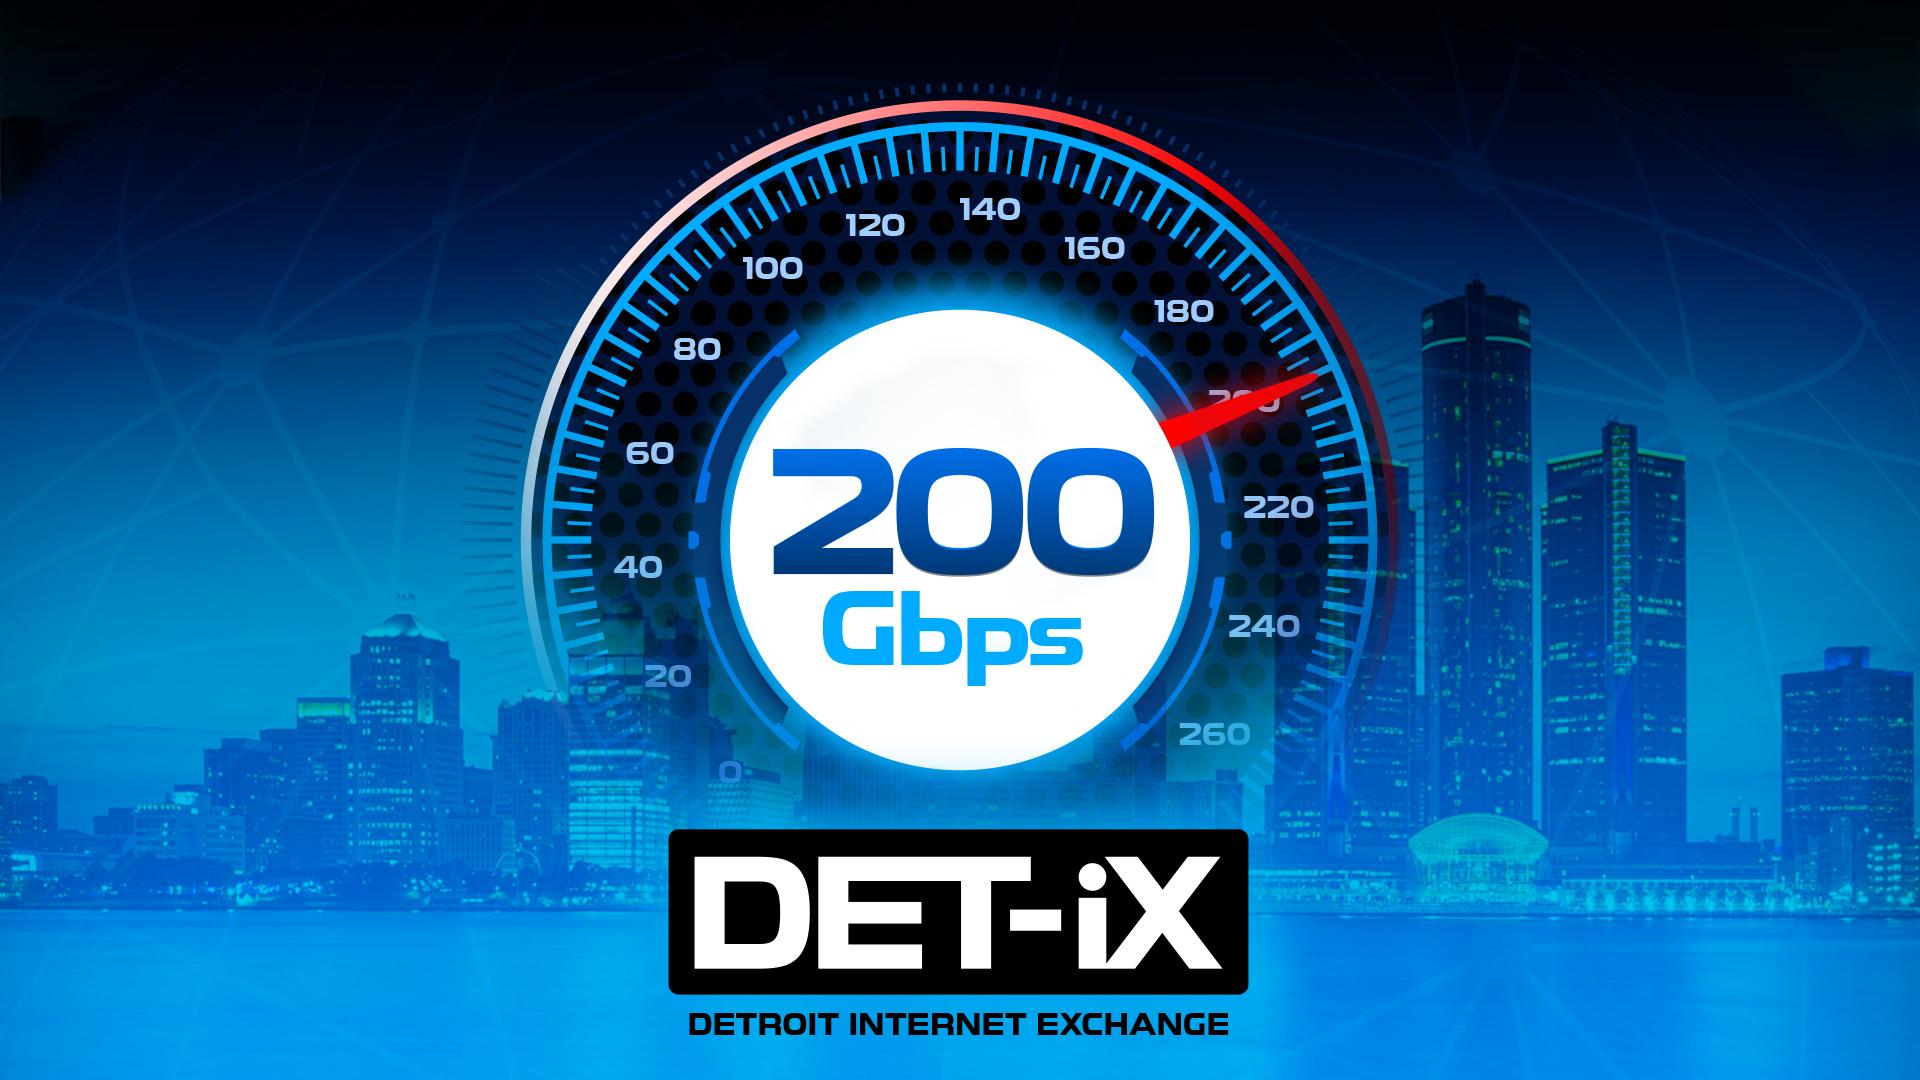 DET-iX Reaches New Heights – 200Gbps Milestone